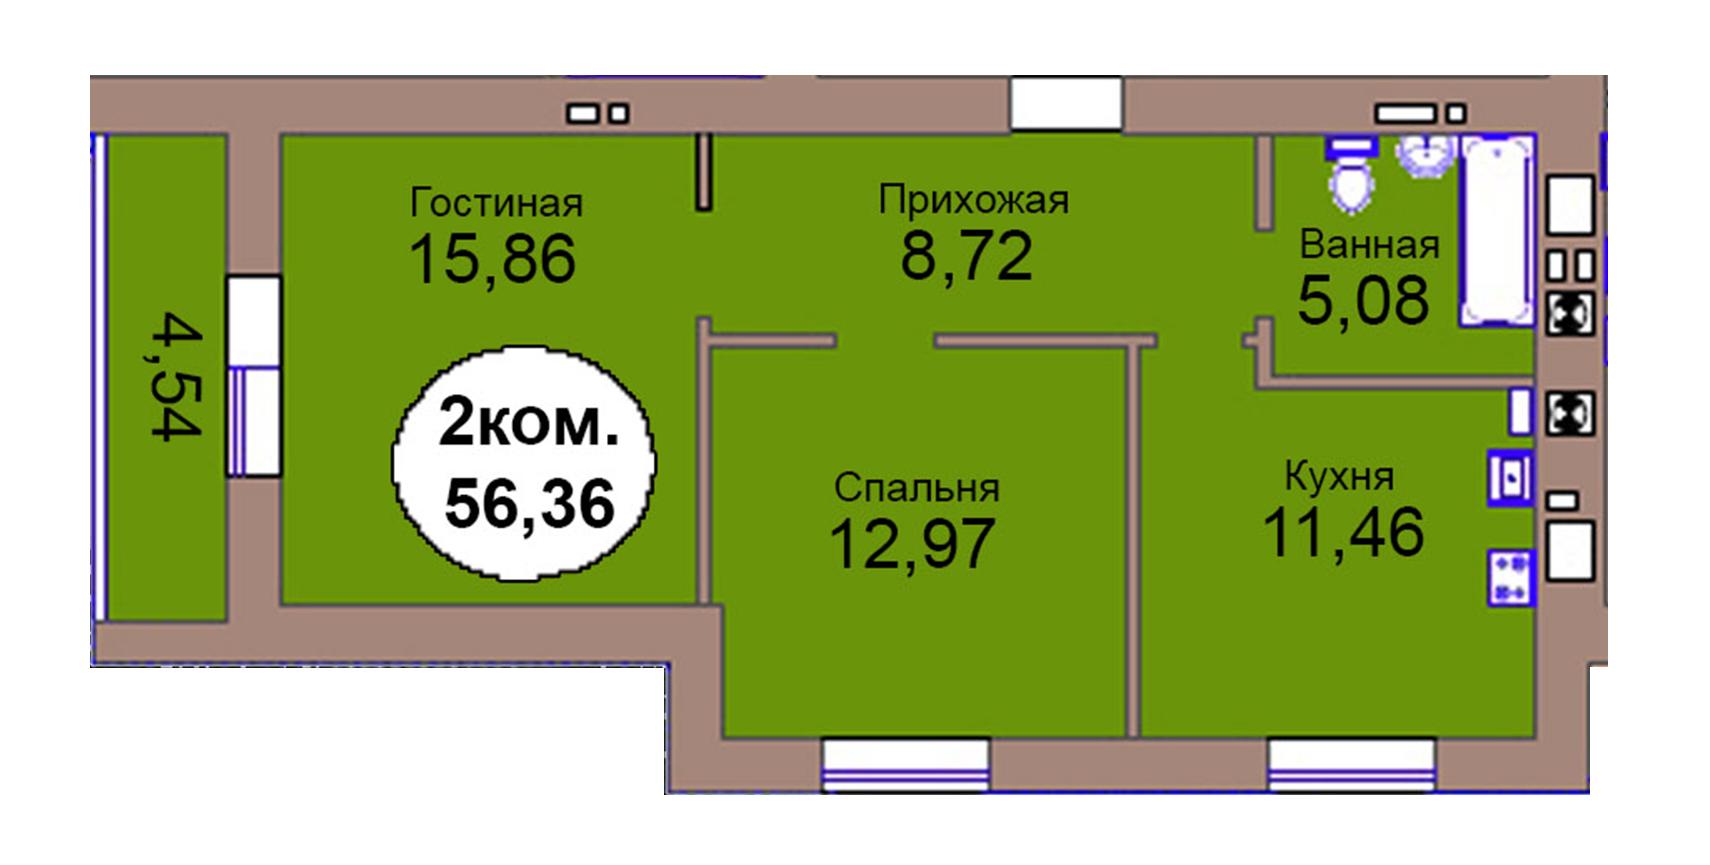 2-комн. кв. по пер. Калининградский, 4  кв. 80 в Калининграде